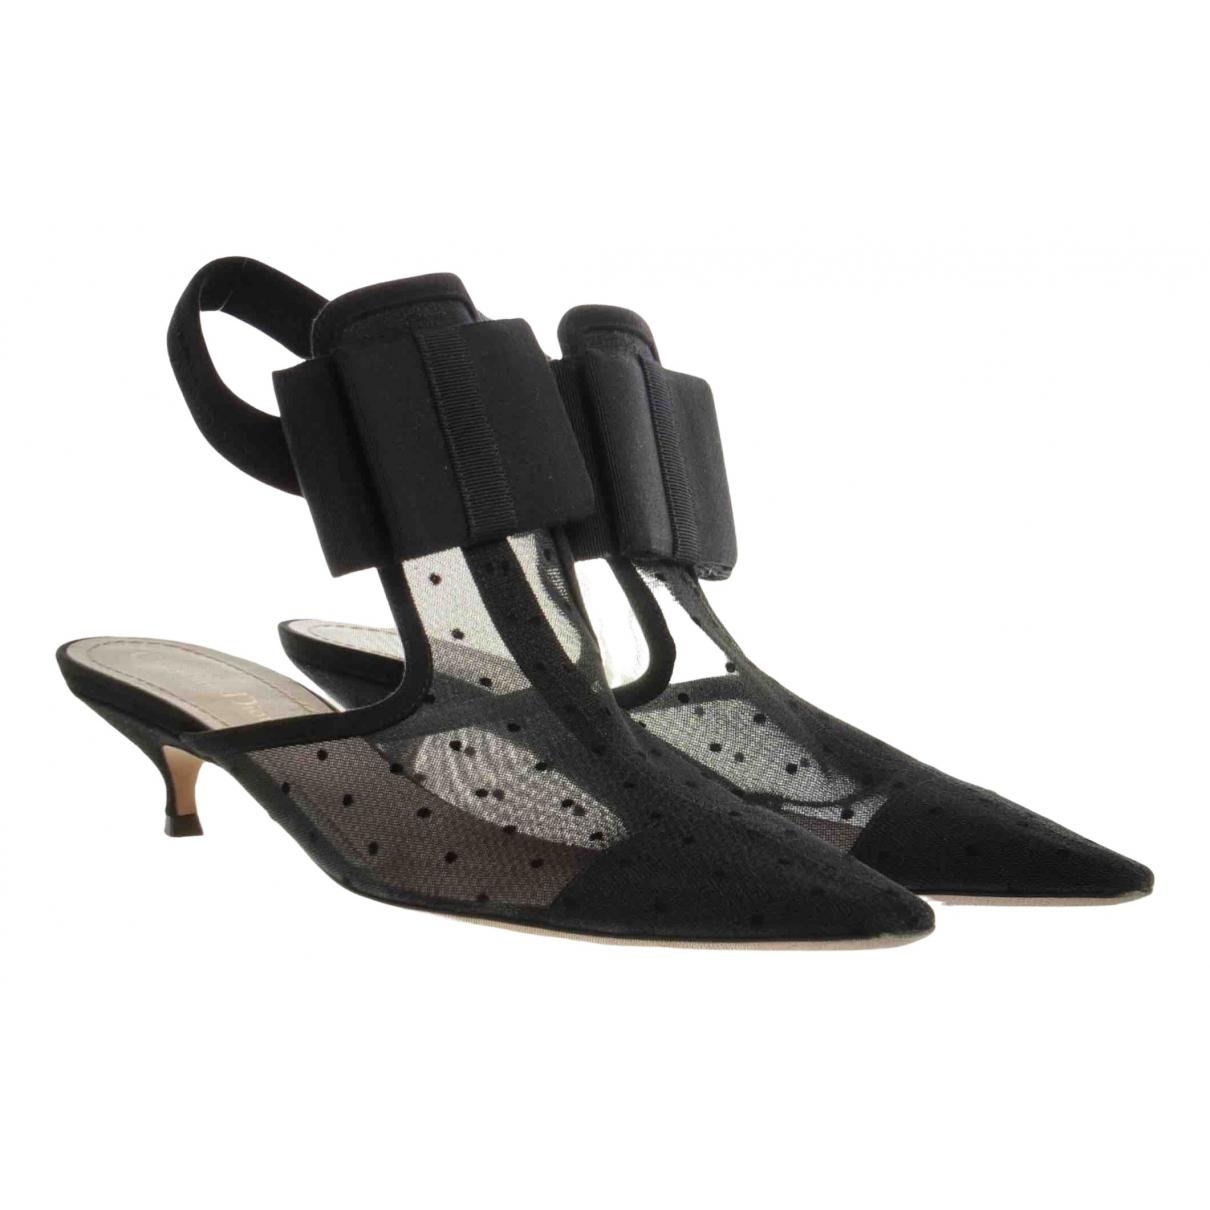 Dior N Black Leather Heels for Women 38 EU